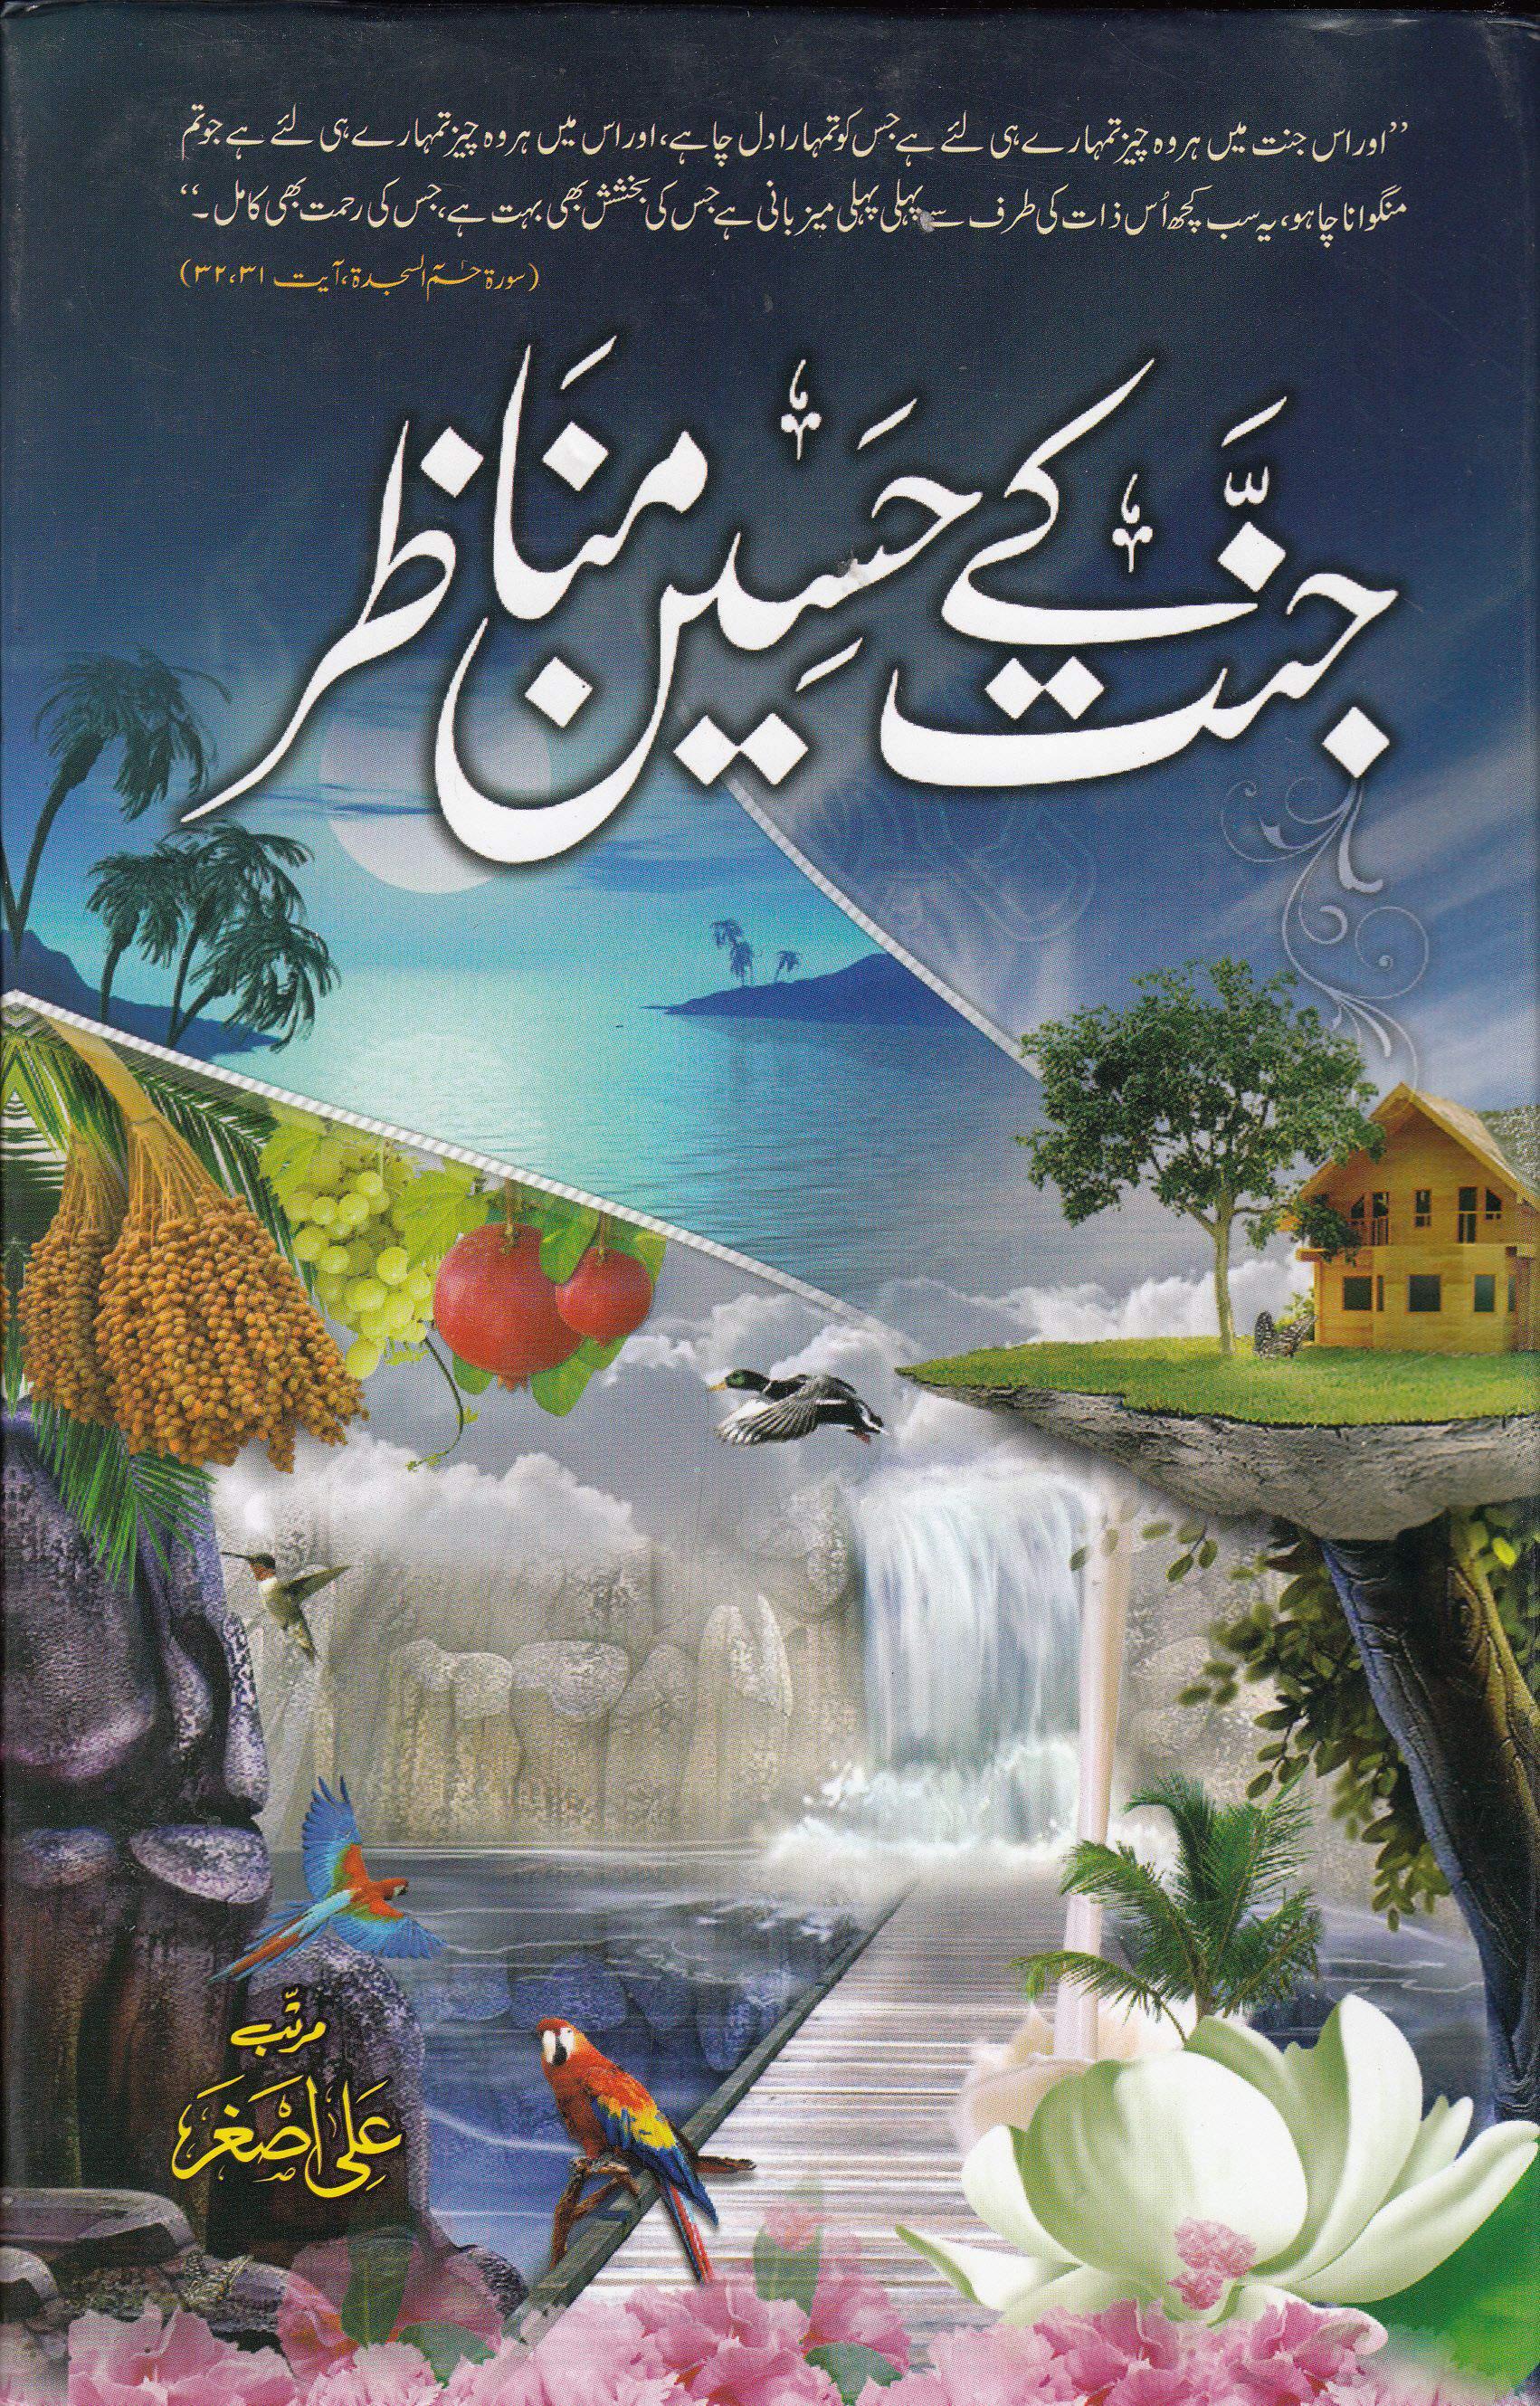 Jannat K Haseen Manazir -